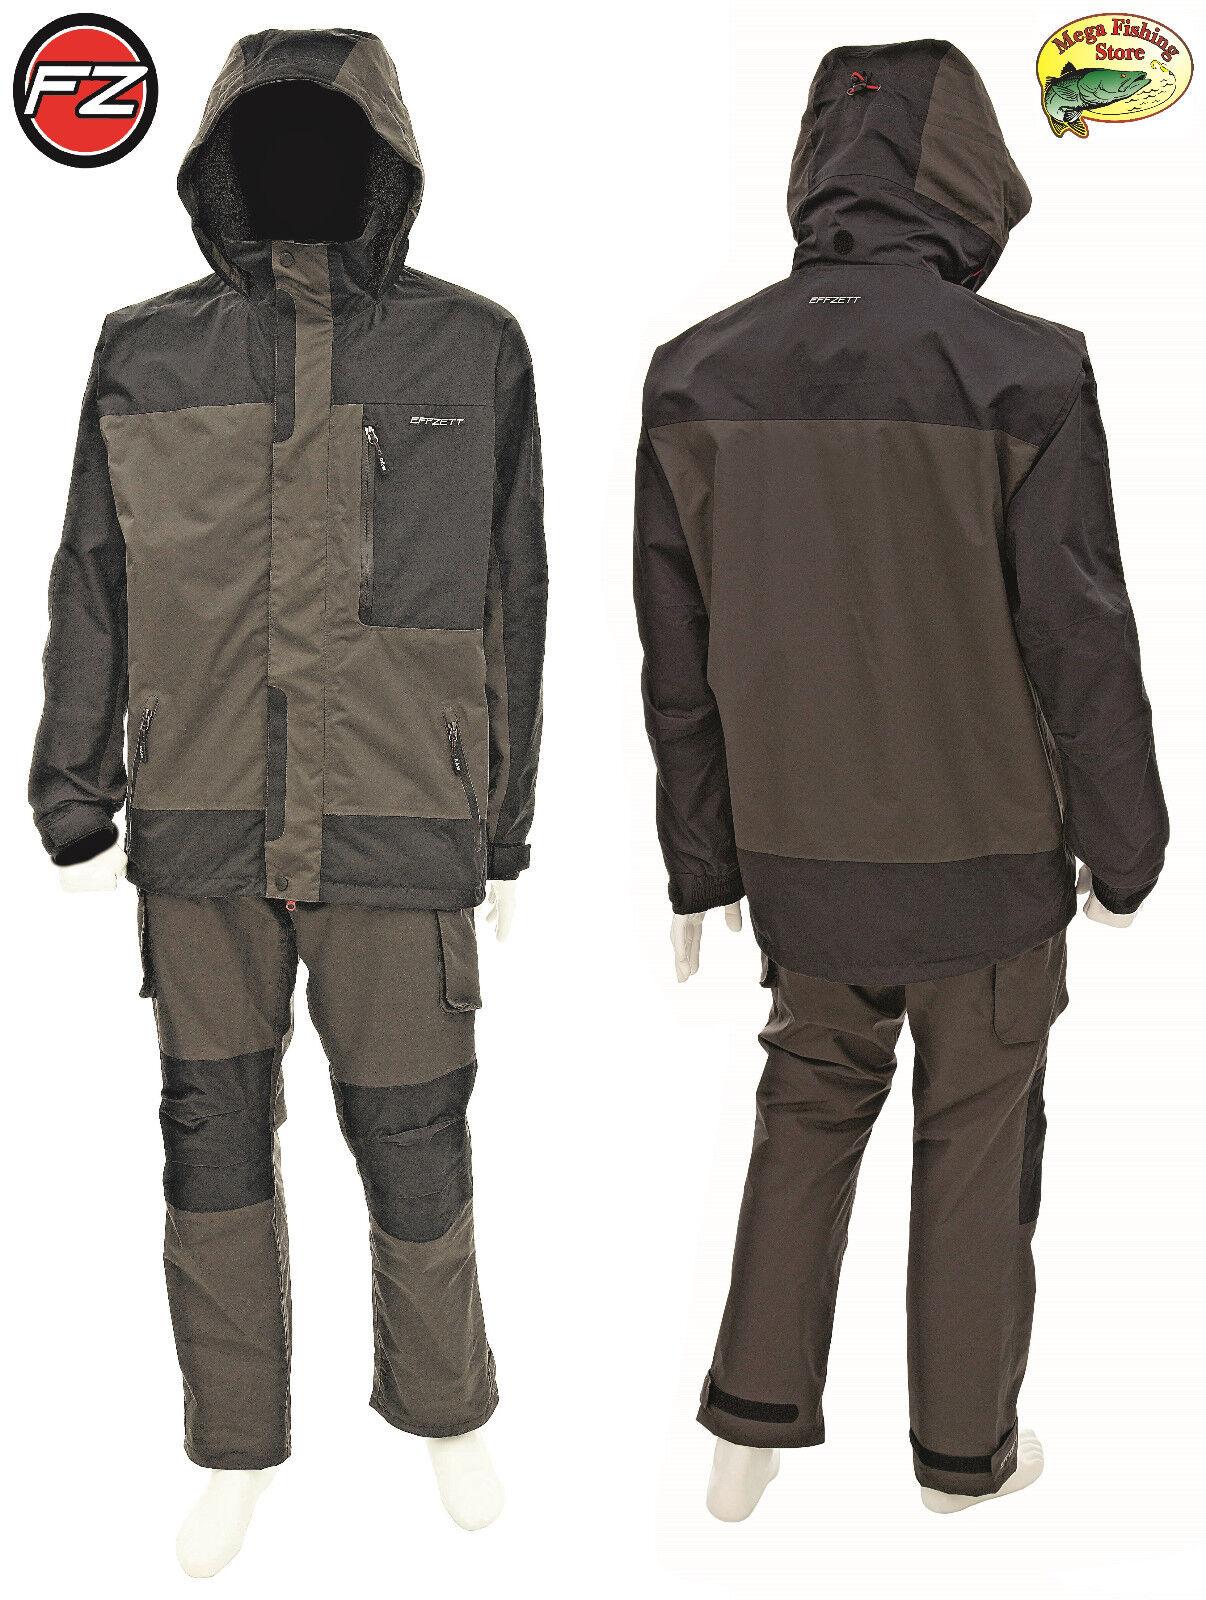 Effzett Technical Angel & outdoor traje-pantalones chaqueta-impermeable transpirable